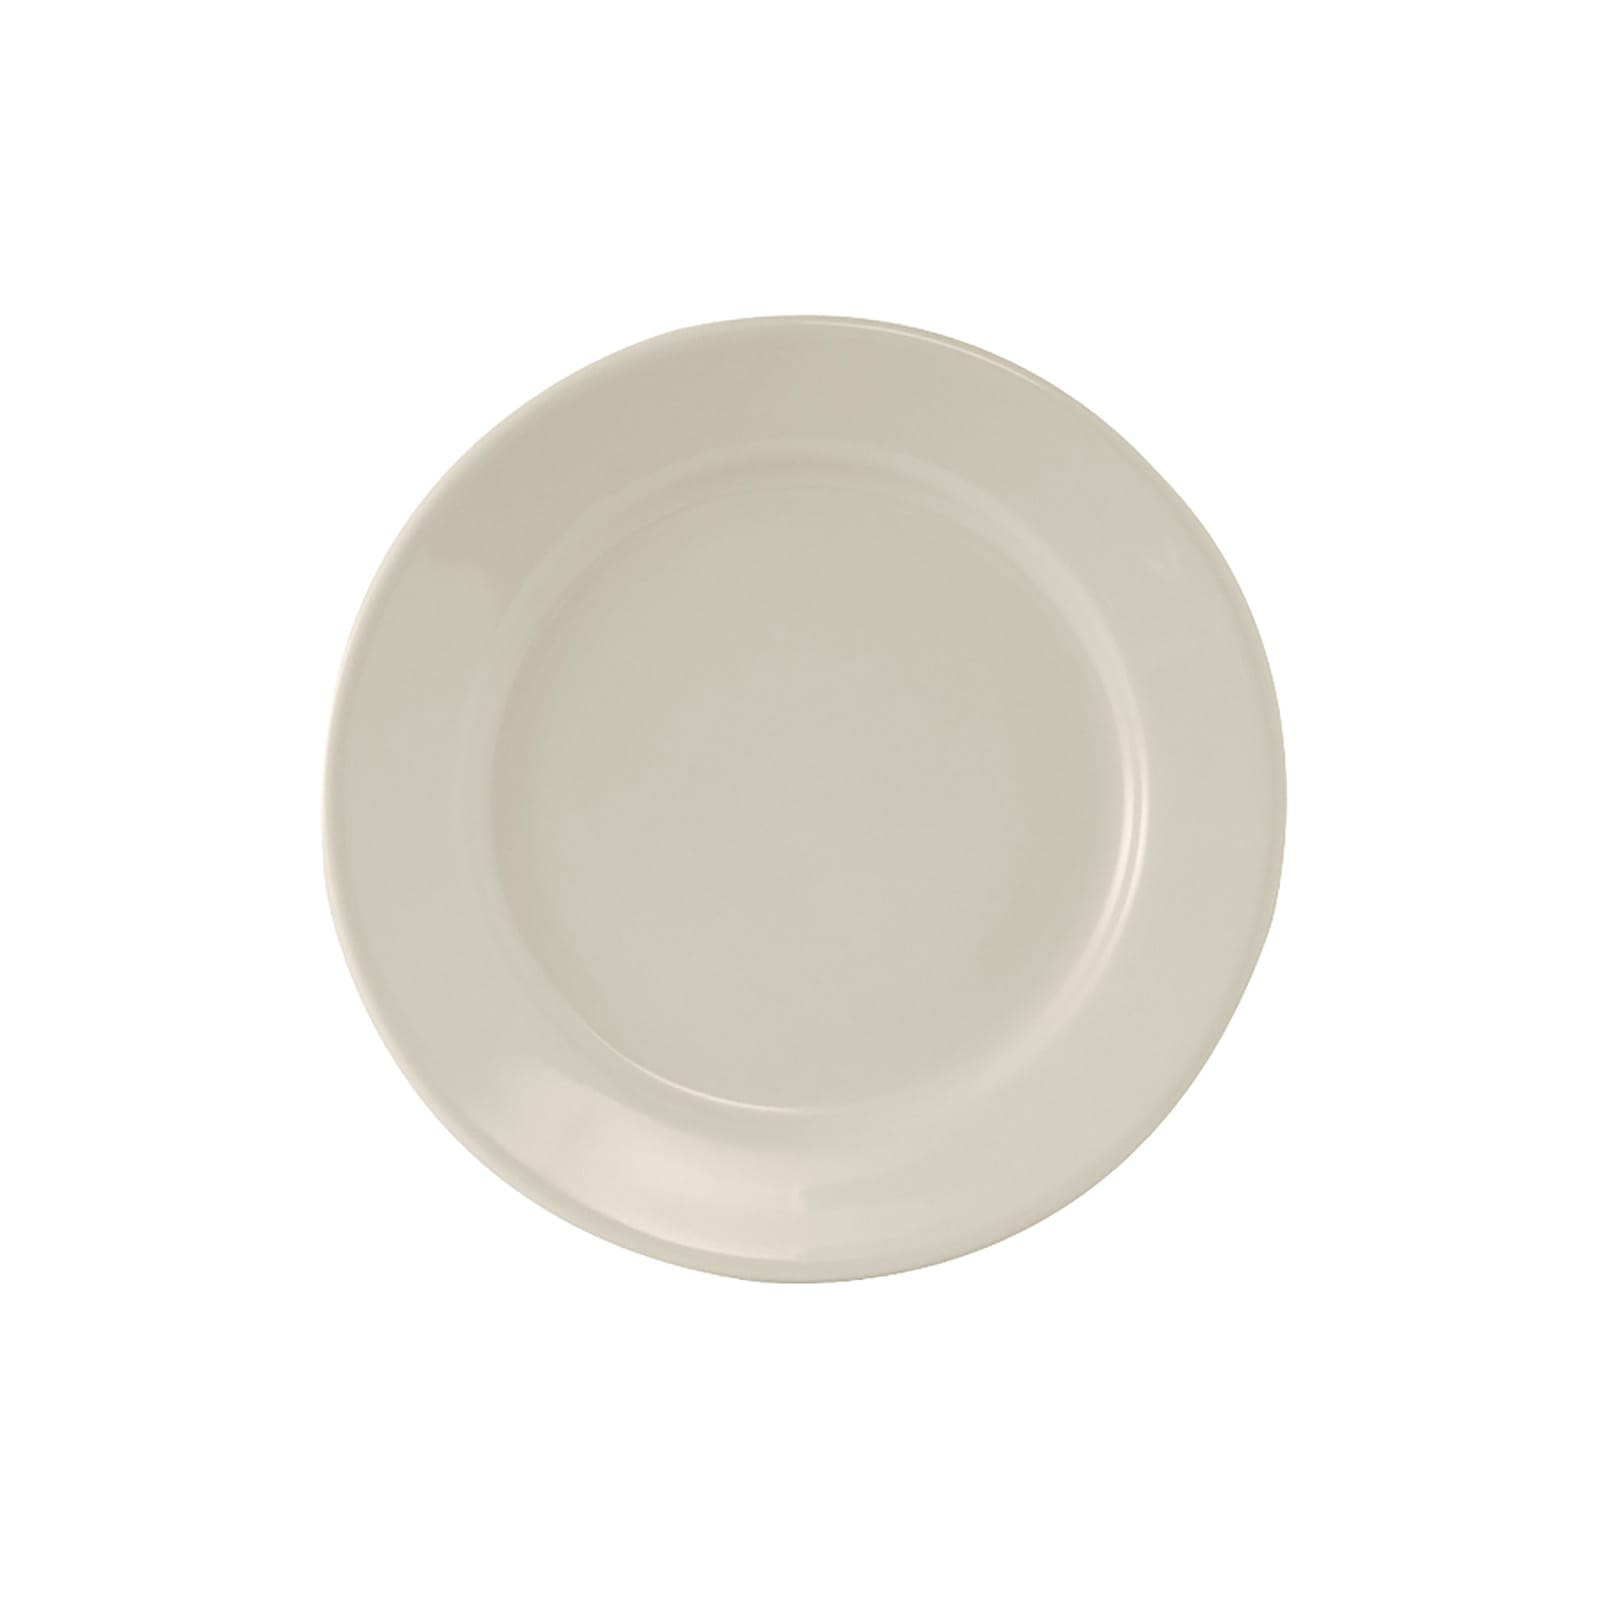 "Tuxton TRE-005 5.5"" Round Reno Plate - Ceramic, American White"